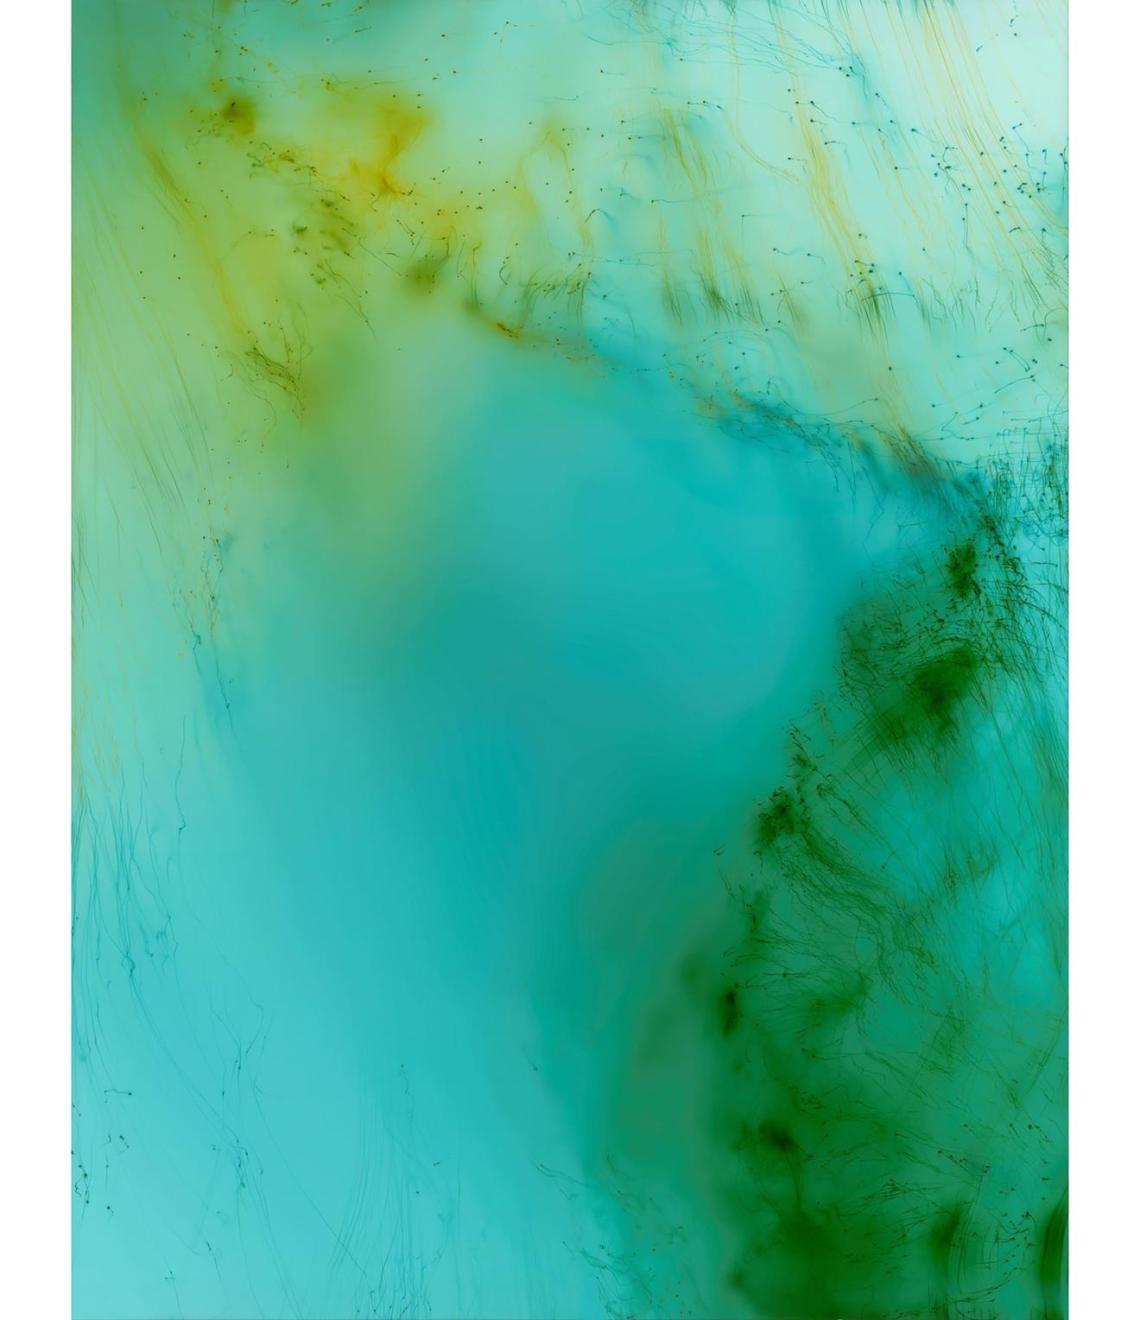 Wolfgang Tillmans: Fragile